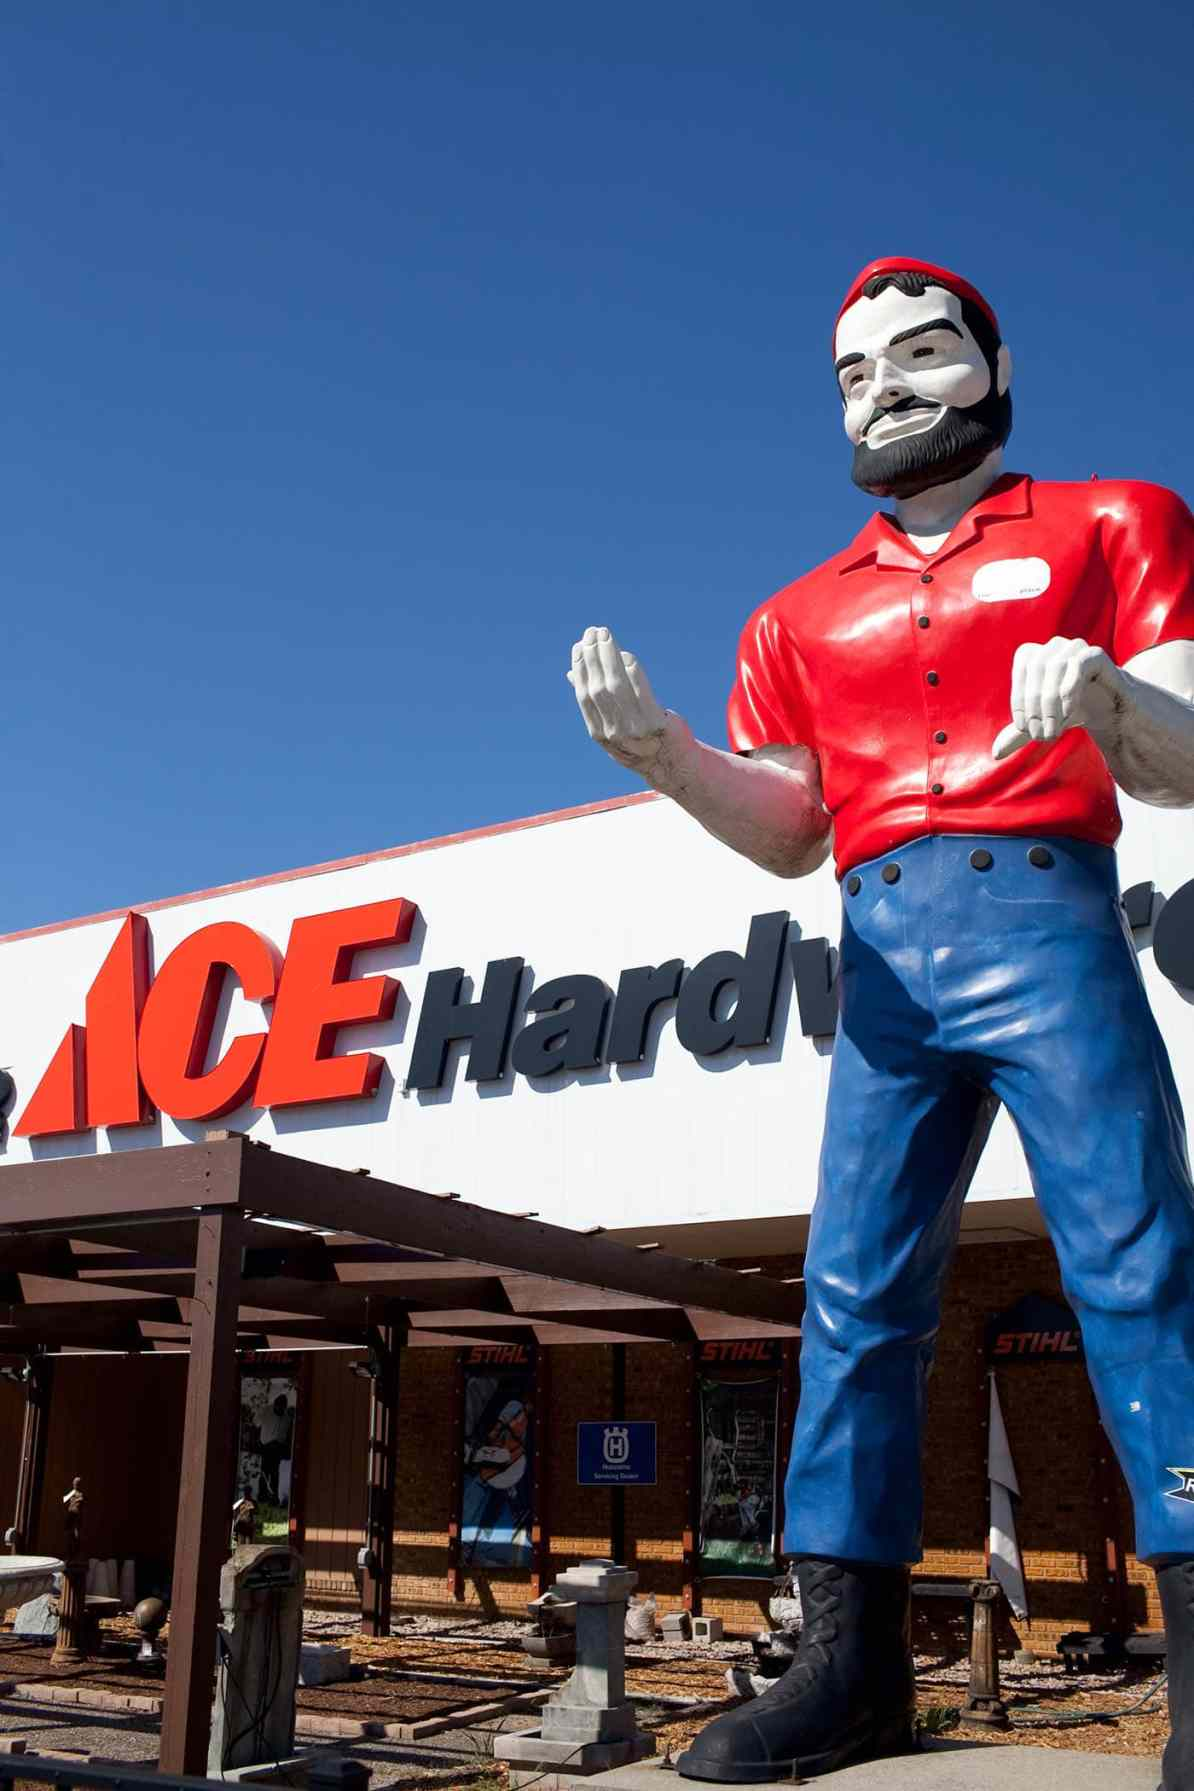 Ace Hardware Muffler Man in Elkhart, Indiana - Indiana Road Trip